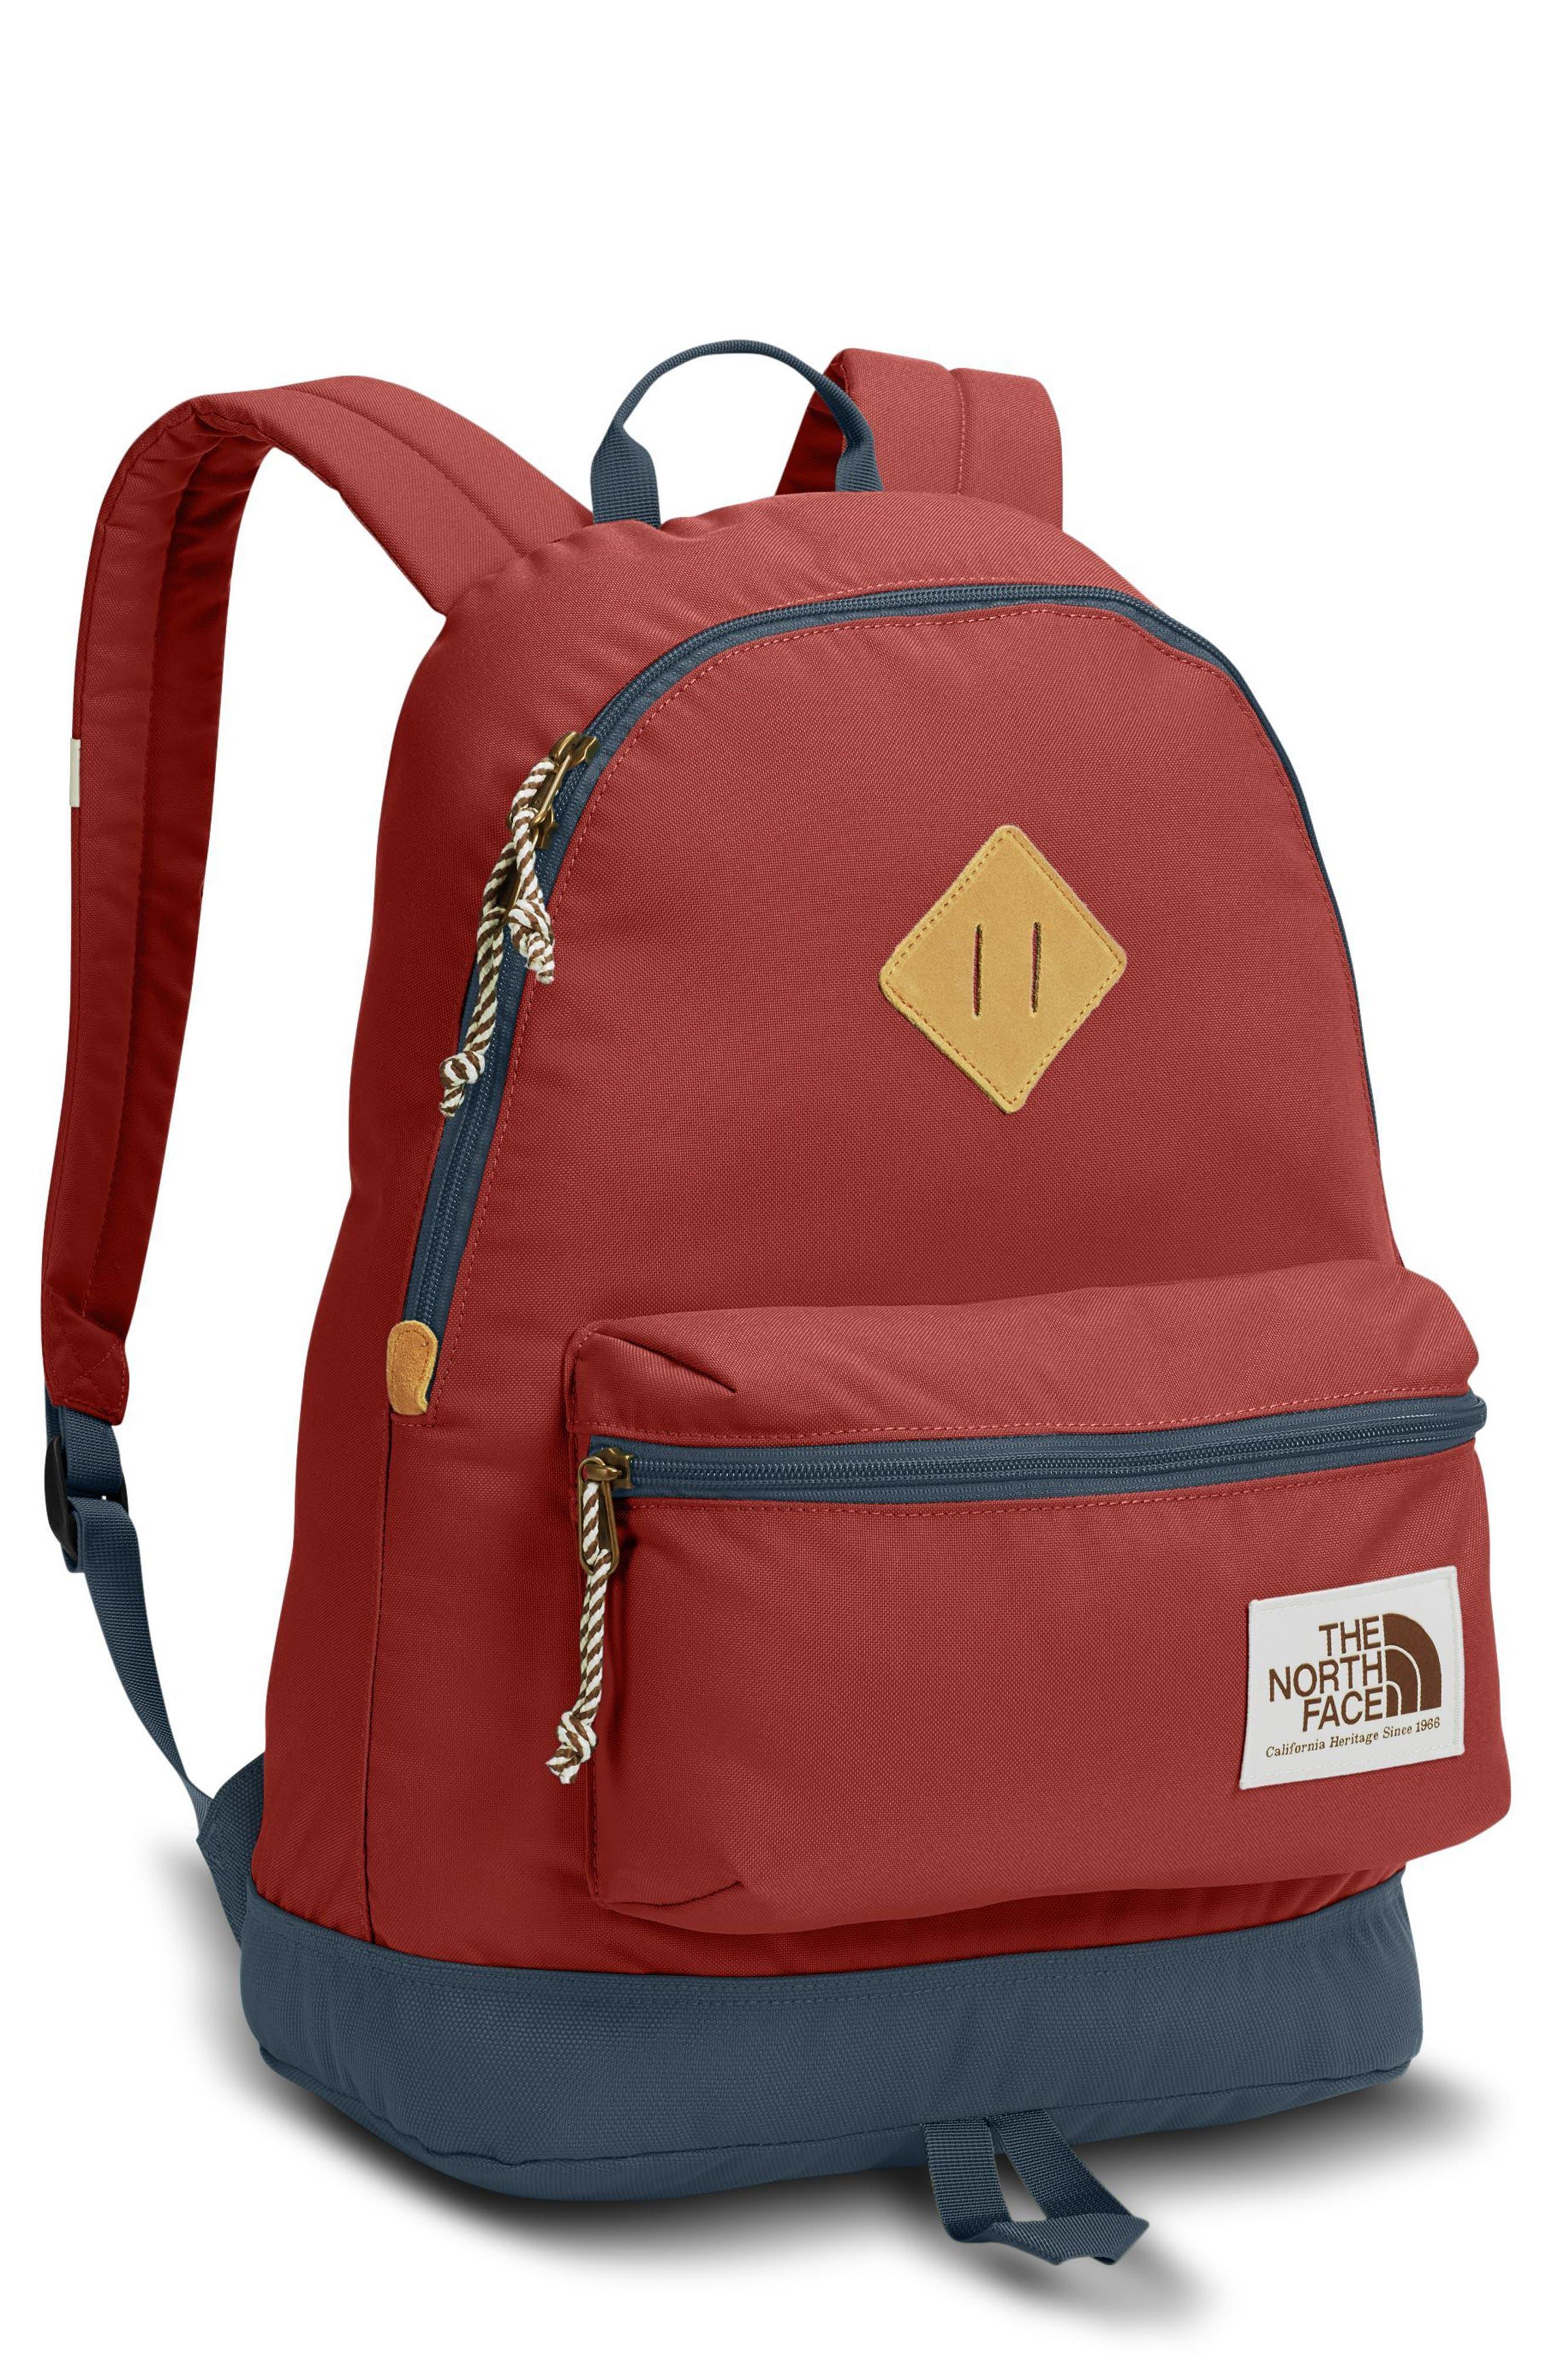 Berkeley Backpack,                             Main thumbnail 1, color,                             Bossa Nova Red/ Conquer Blue